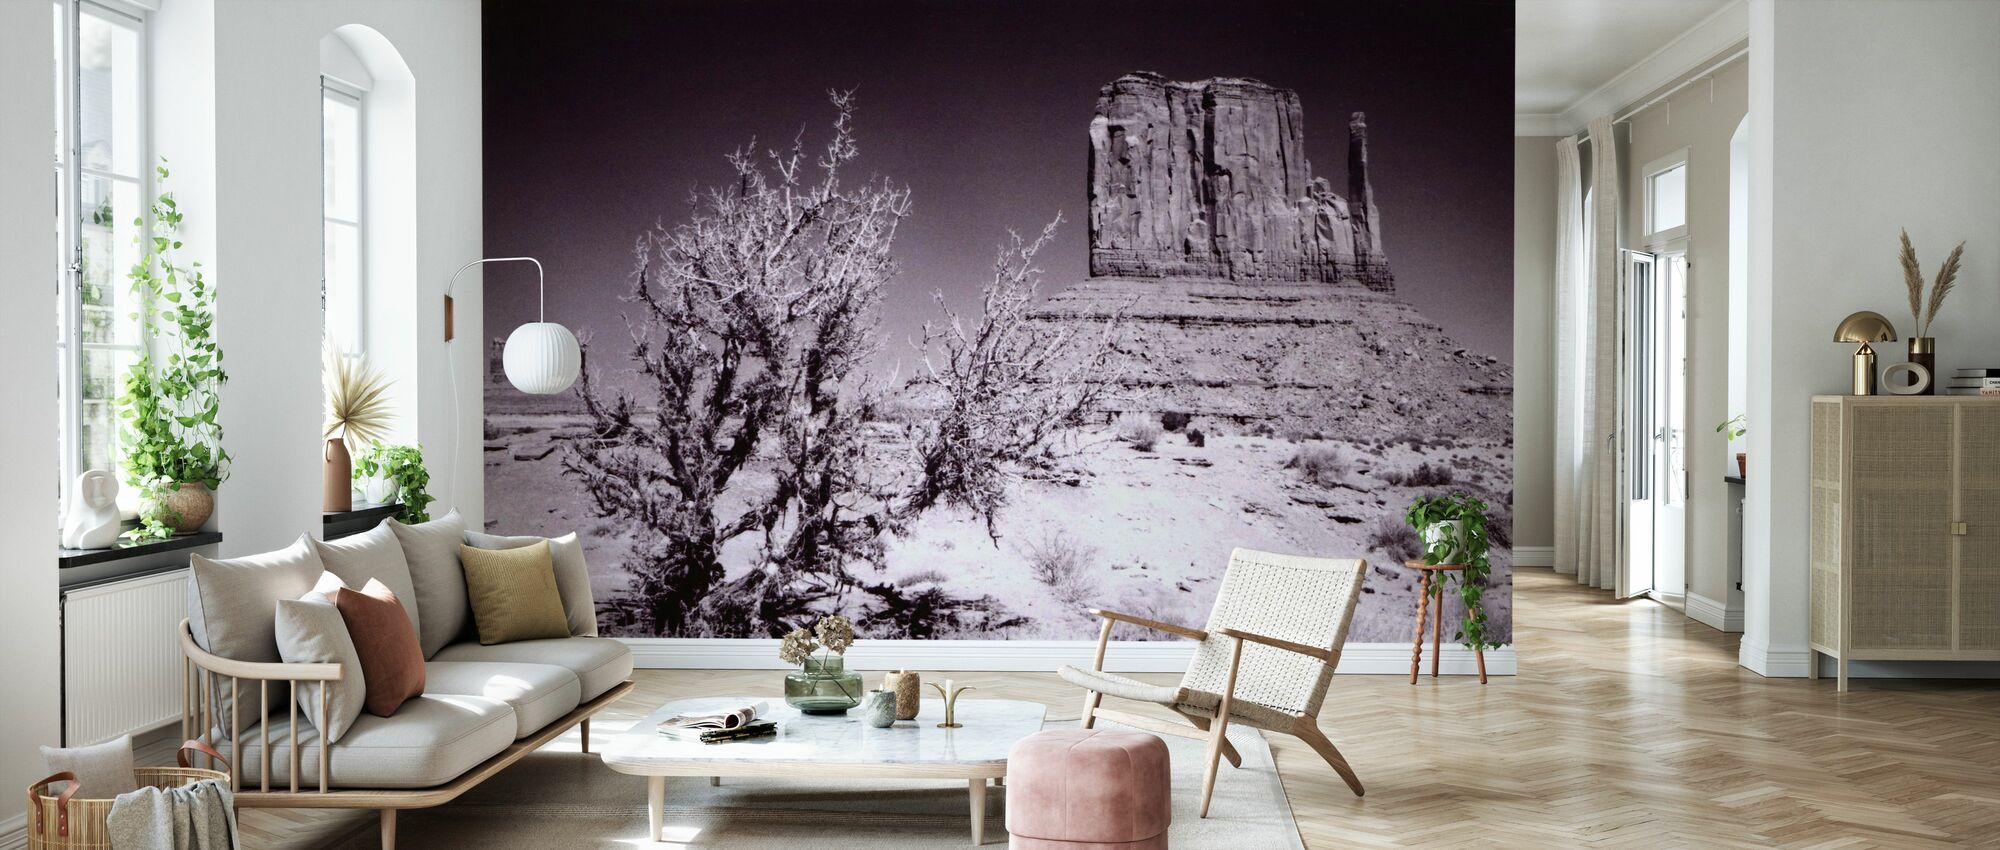 Monument Valley, Utah, USA - Tapet - Stue